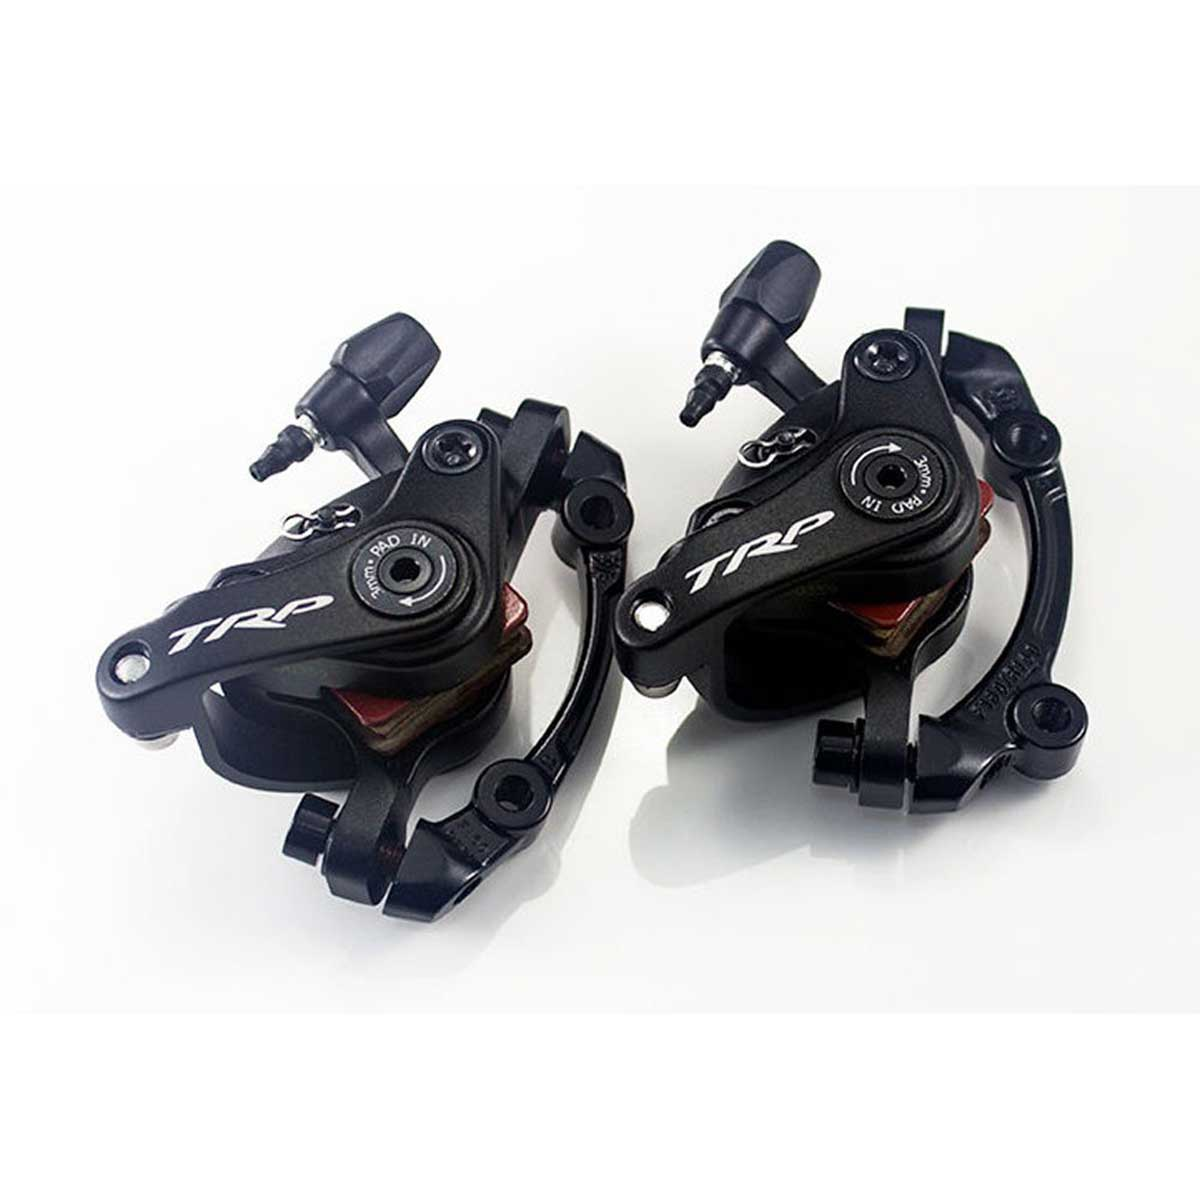 PAIR TRP SPYKE Mechanical Disc Brake Dual Side Actuation Mountain Bike Set 160mm